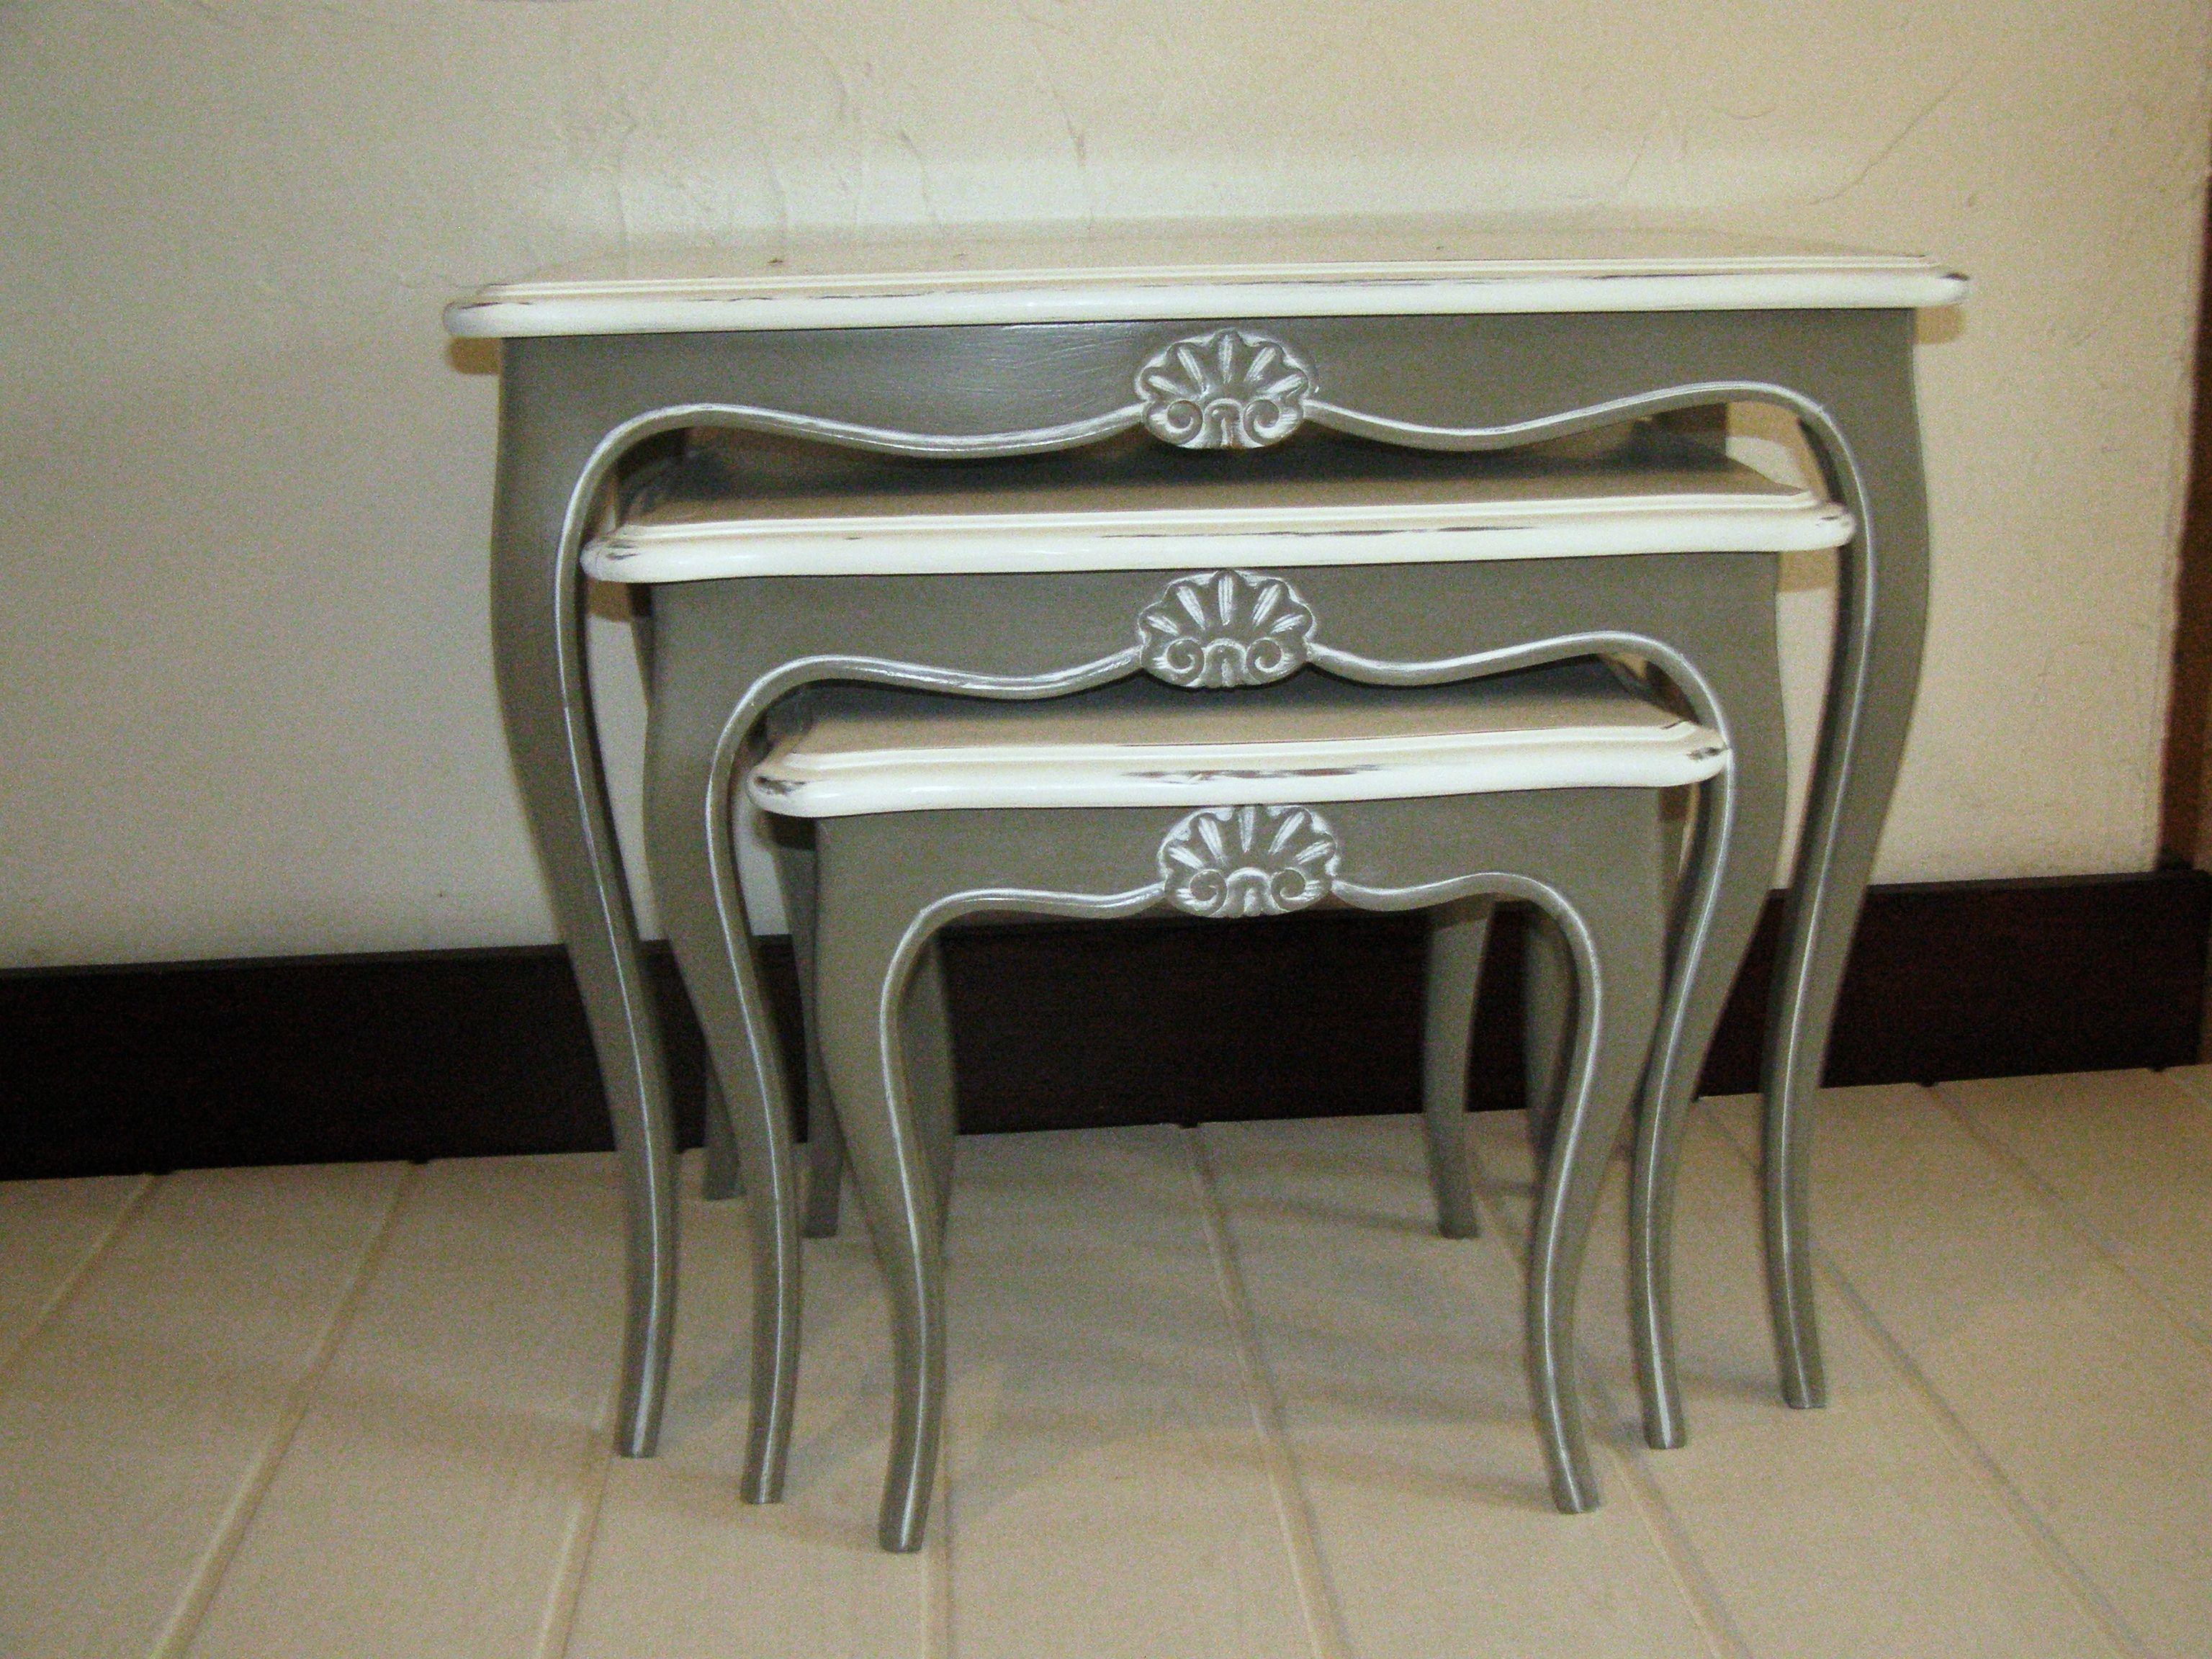 jolies petites tables gigognes relook e dans l 39 esprit. Black Bedroom Furniture Sets. Home Design Ideas